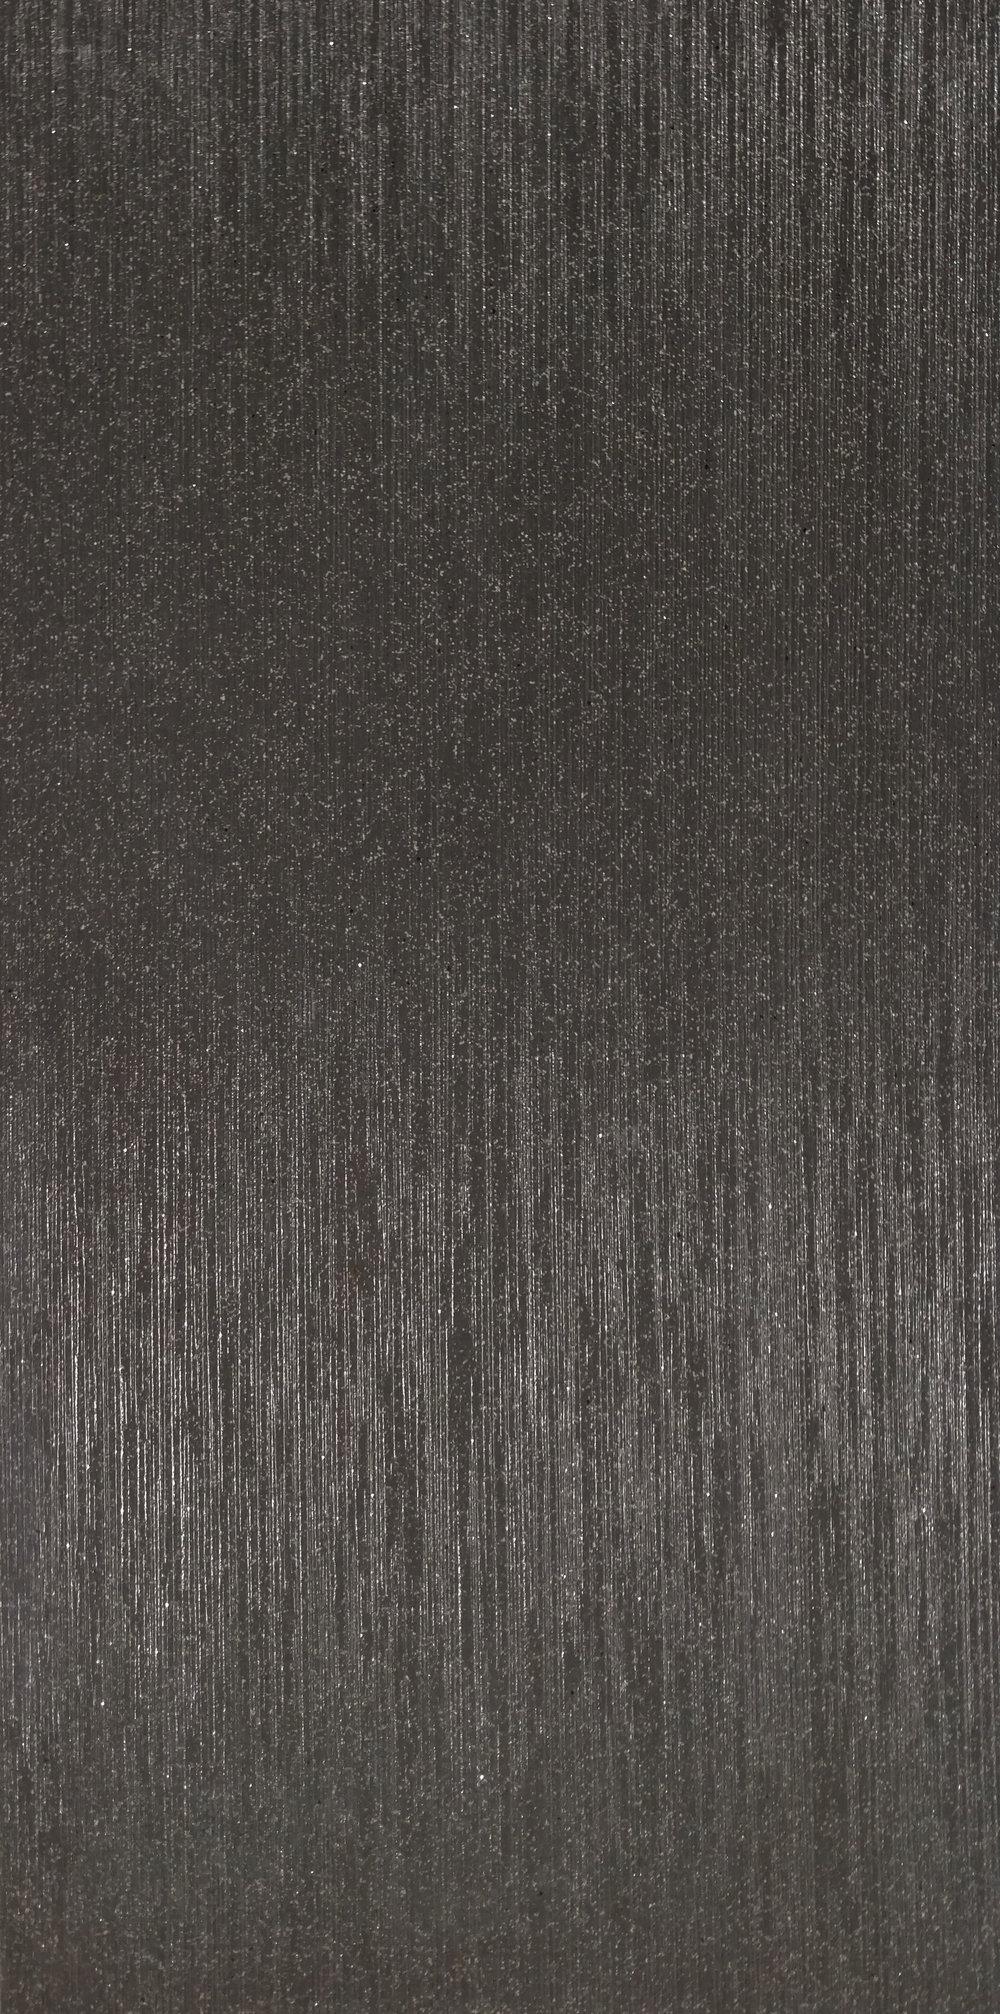 "ALLURE- SAPPHIRE BLACK 12""X24""   8 PC/CTN (15.5 SF); 40 CTN/PLT"